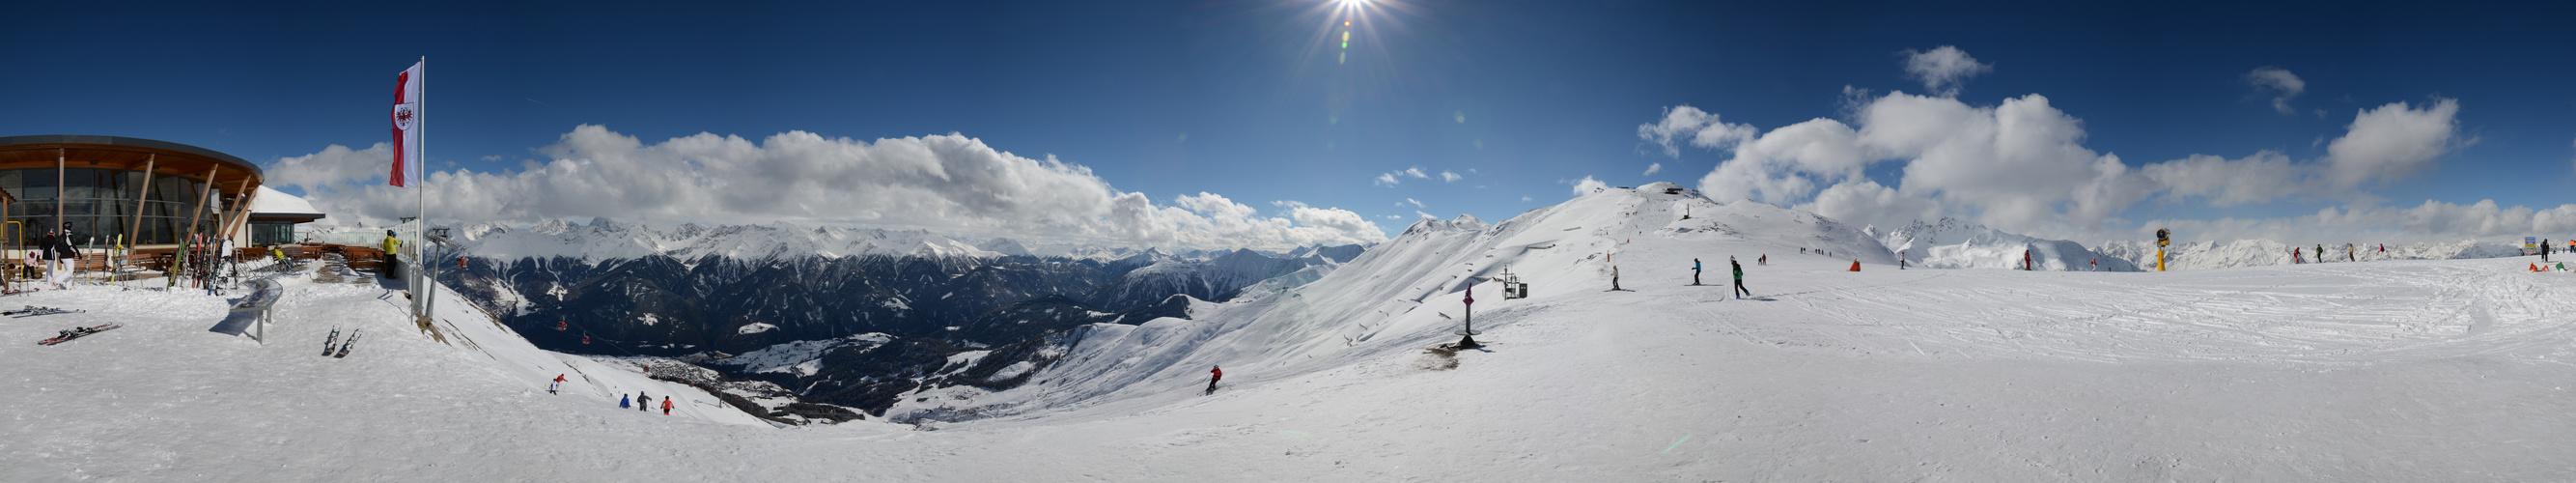 Perfektes Skiwetter